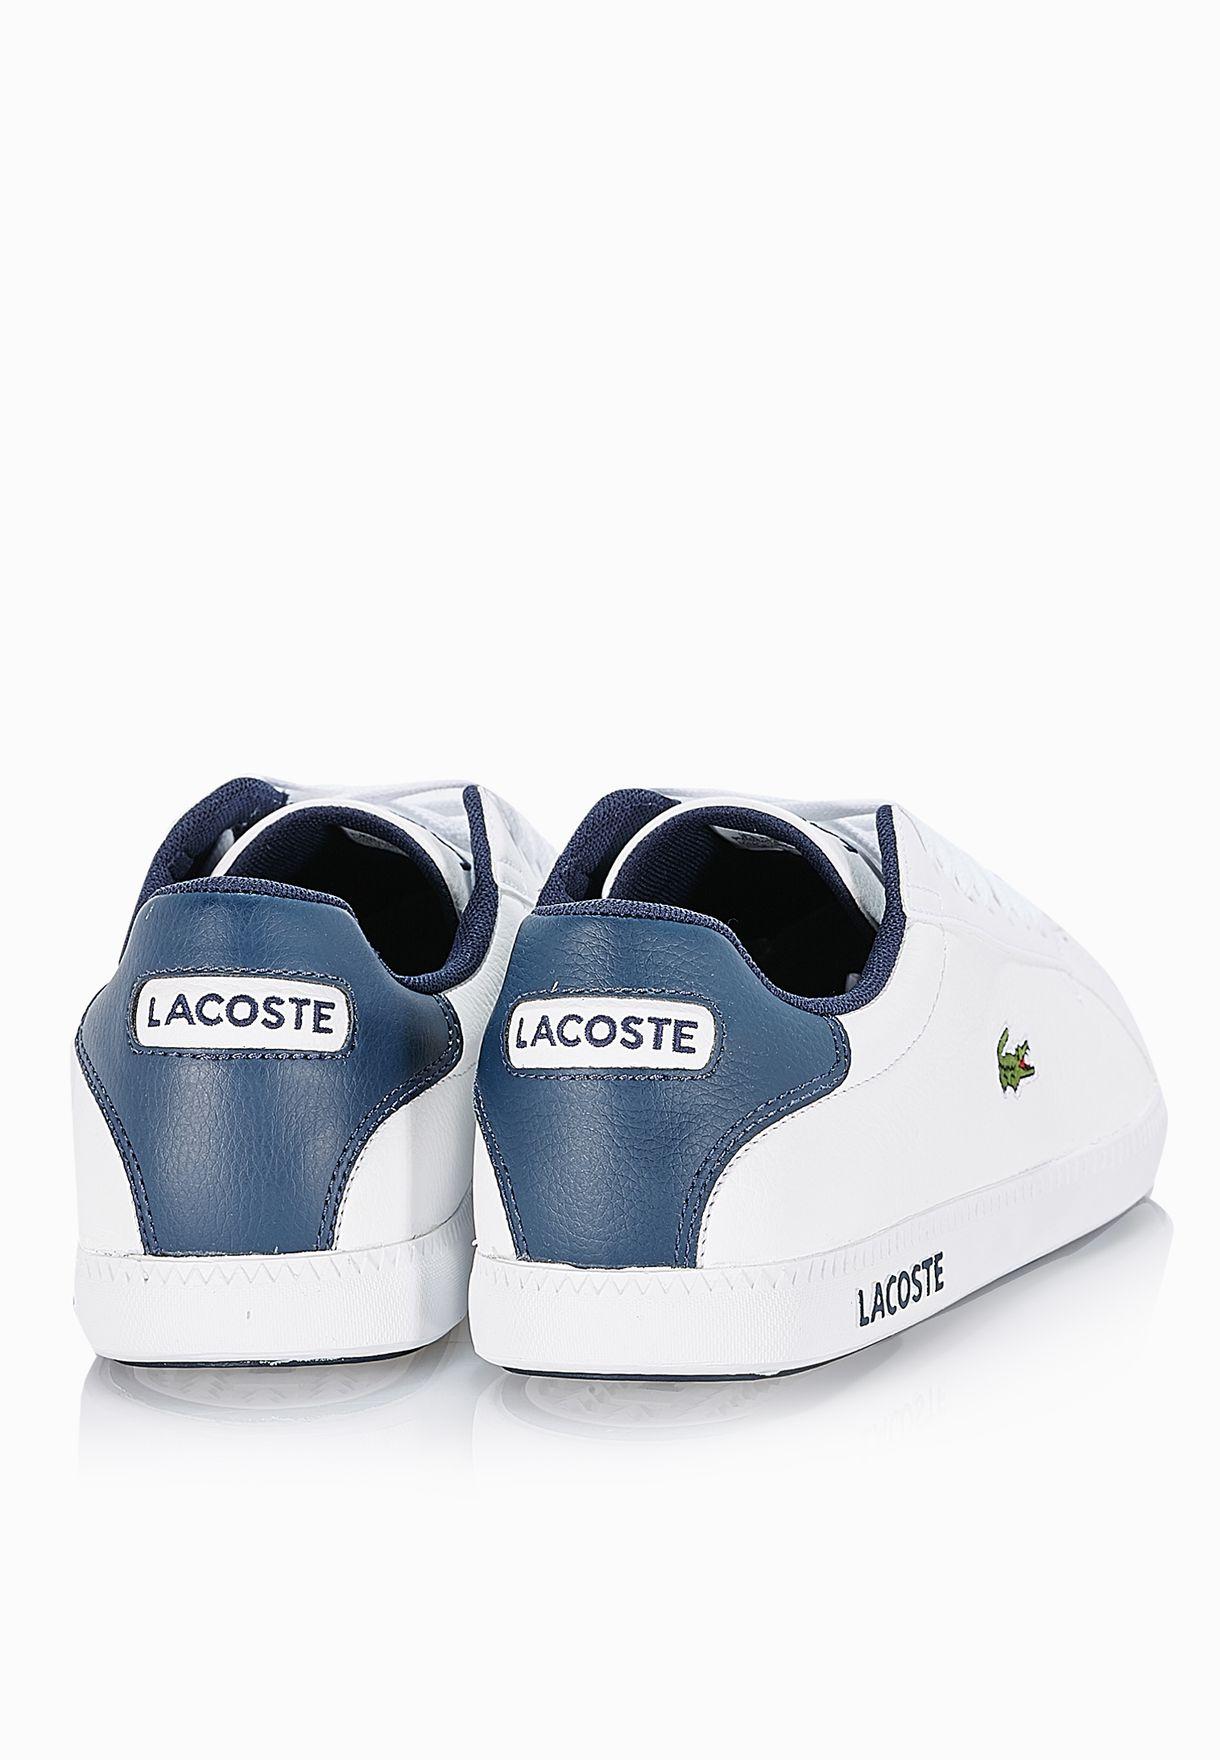 Graduate Lcr3 Sneakers